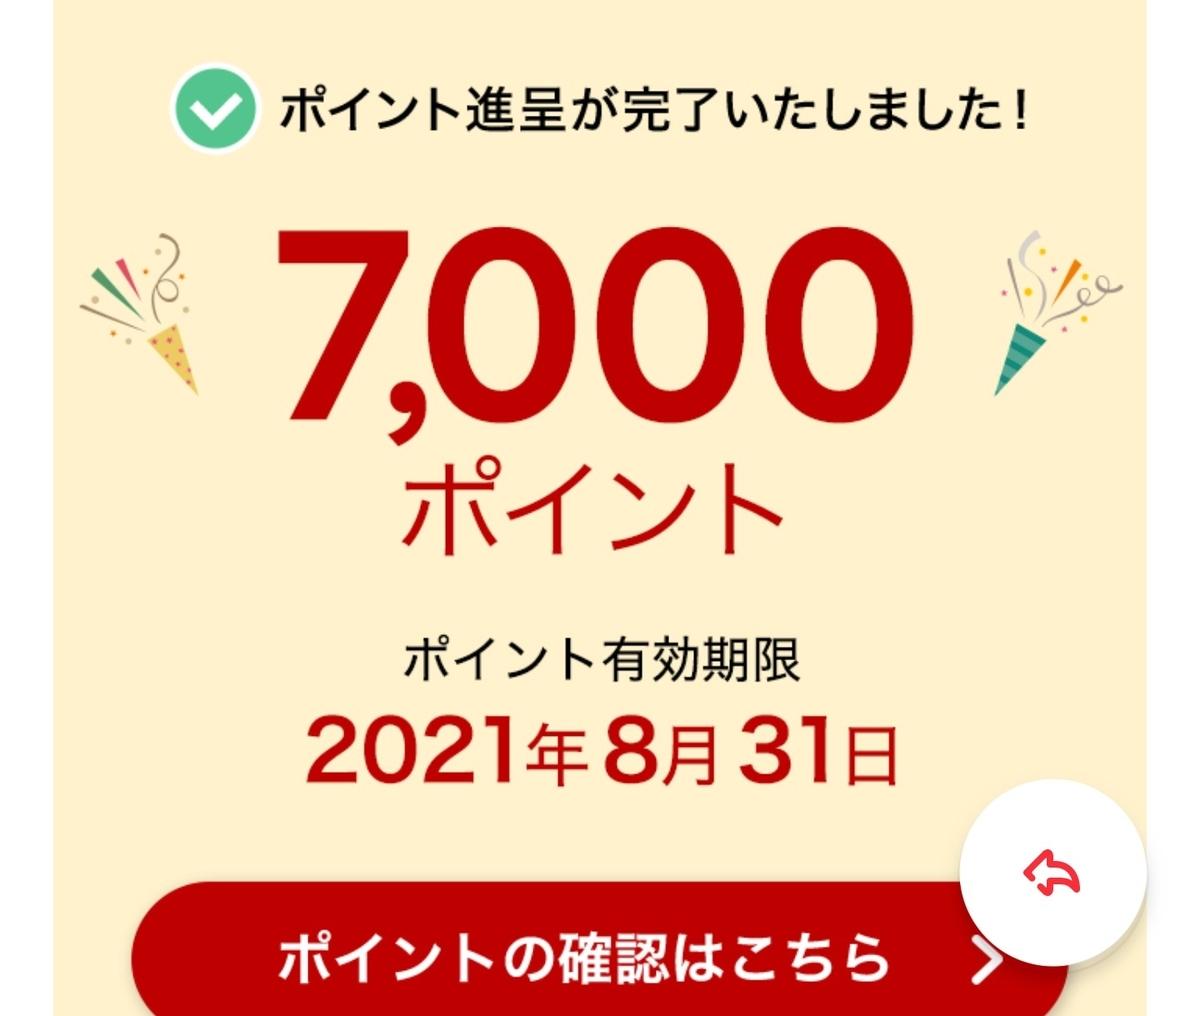 f:id:hyumama:20210809220227j:plain